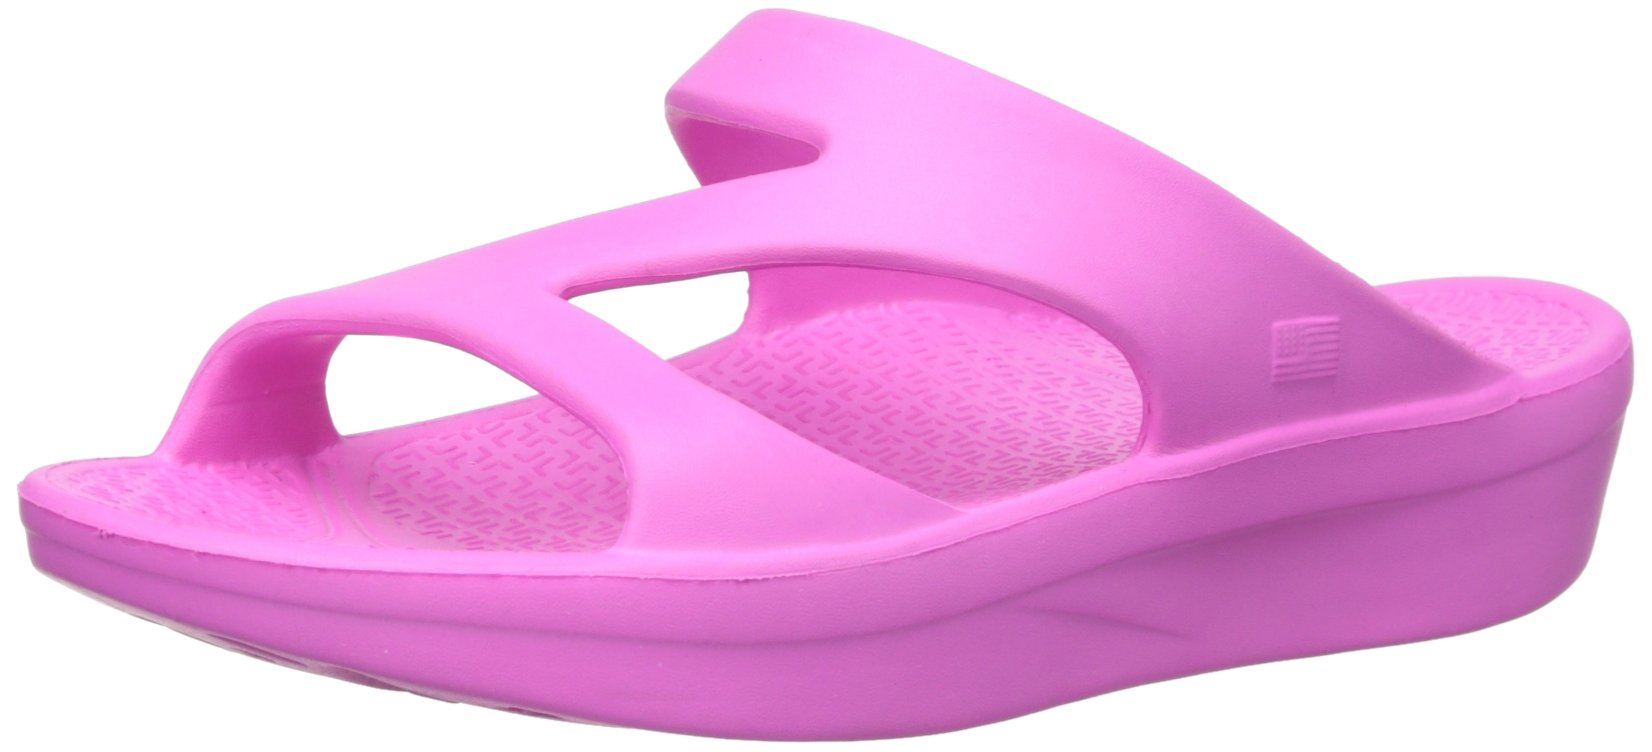 Telic Z-Strap Soft Sandal Shoe Footwear by, Pink Flamingo, S